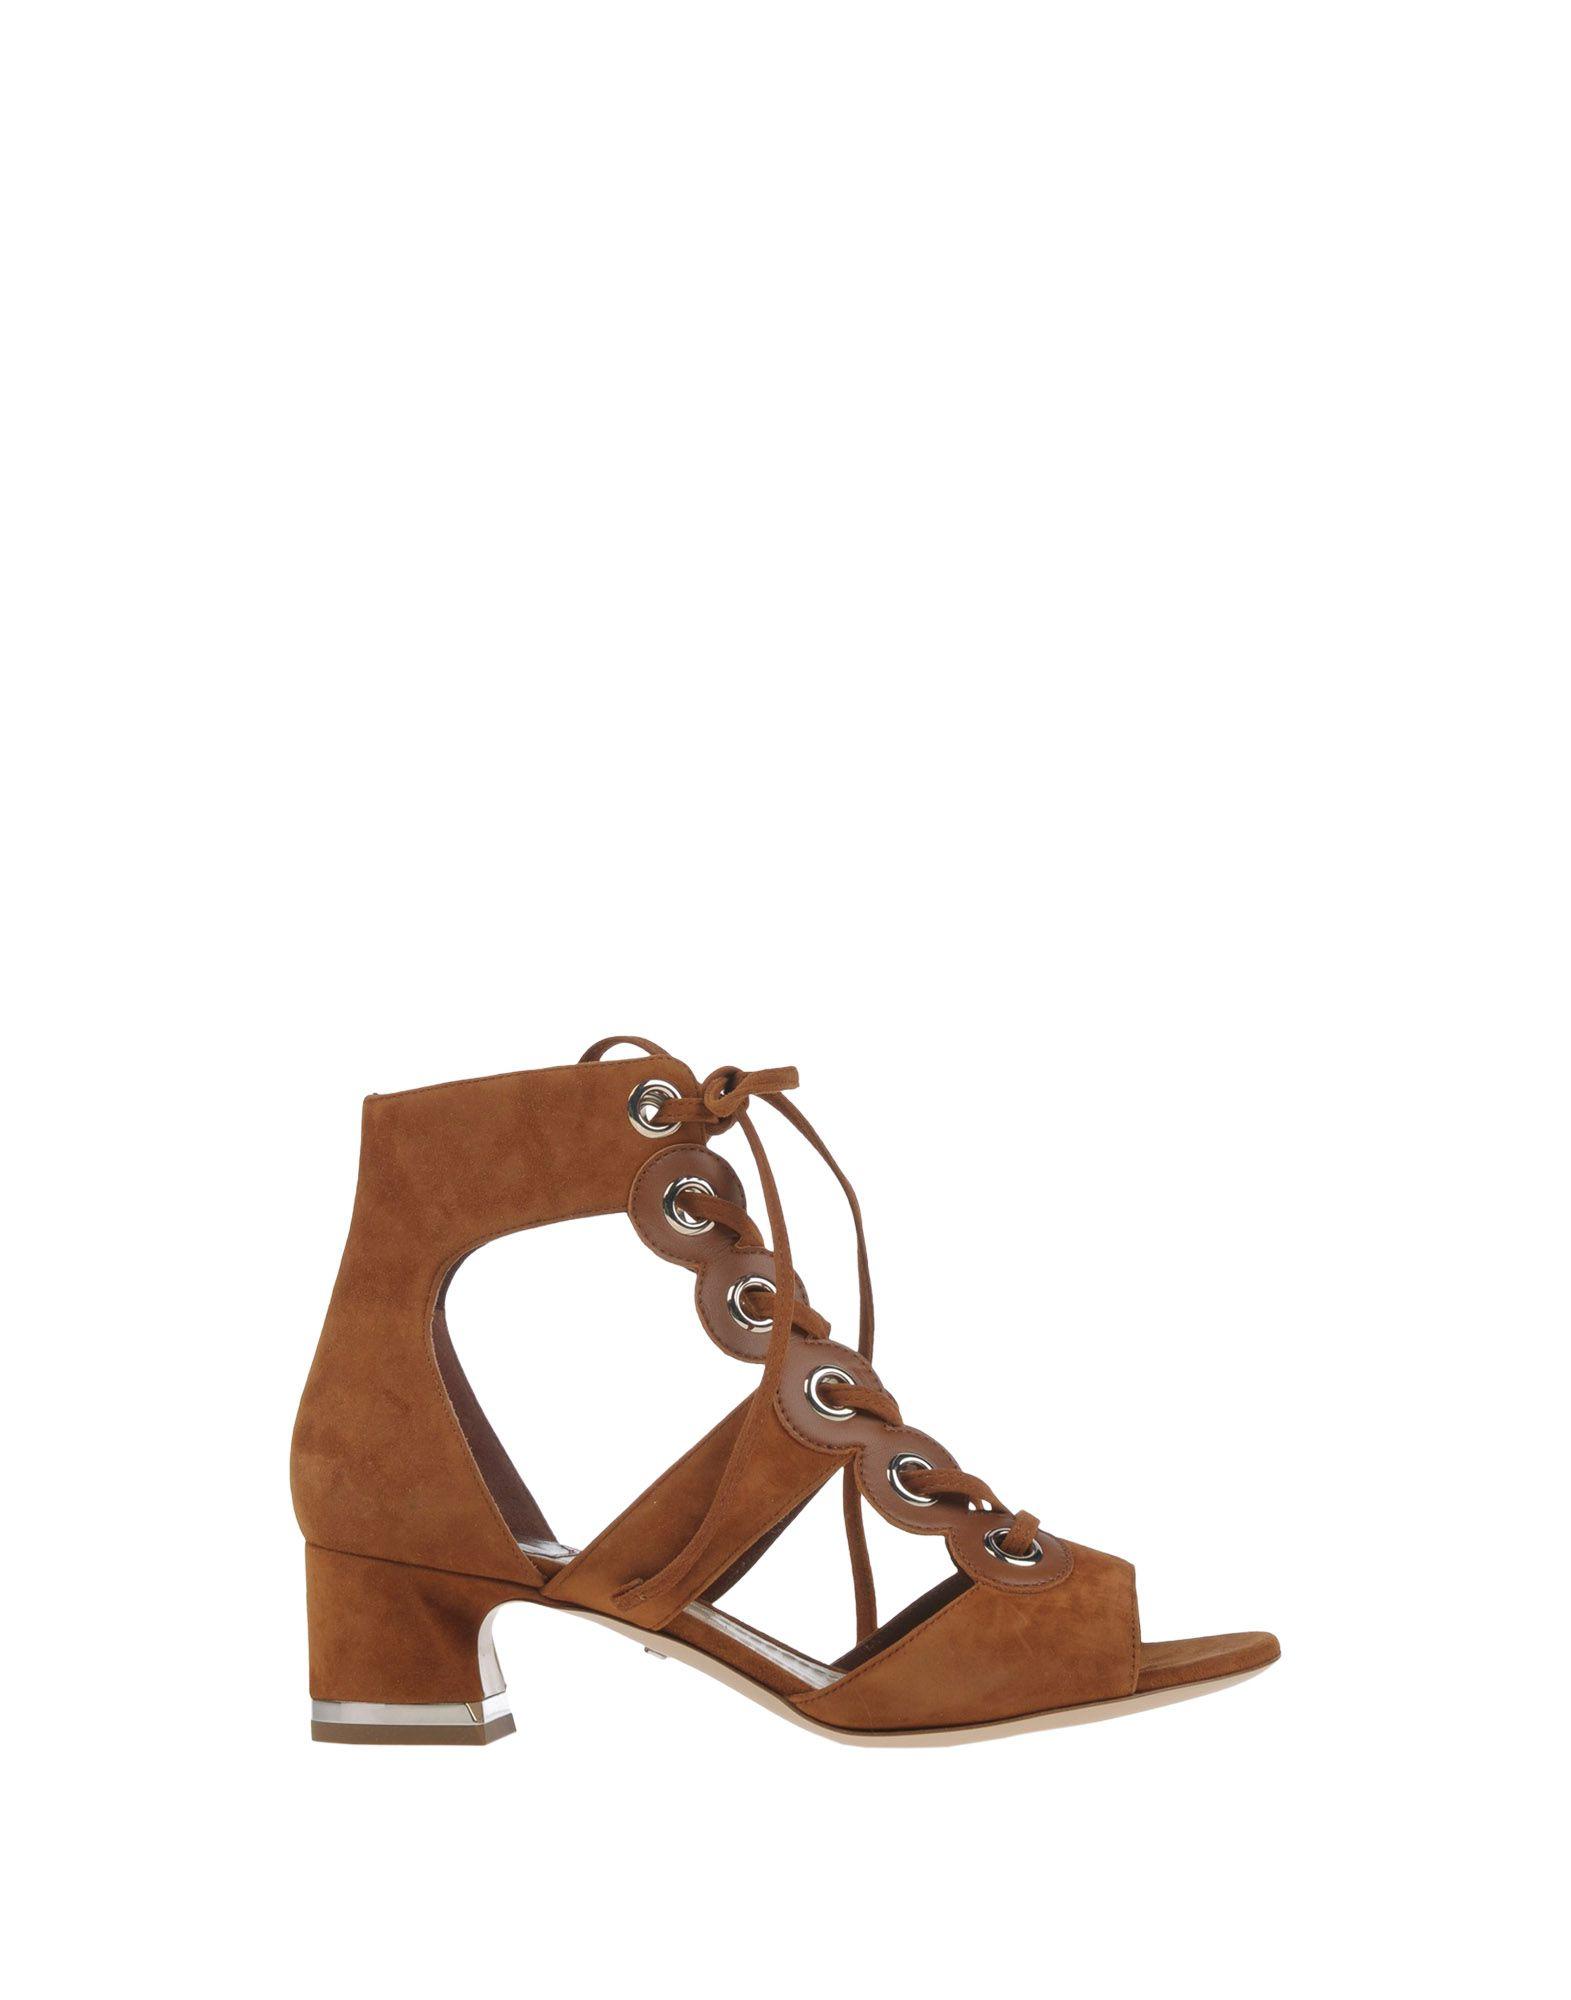 Dior Sandalen Damen gut  11339226TCGünstige gut Damen aussehende Schuhe c18978